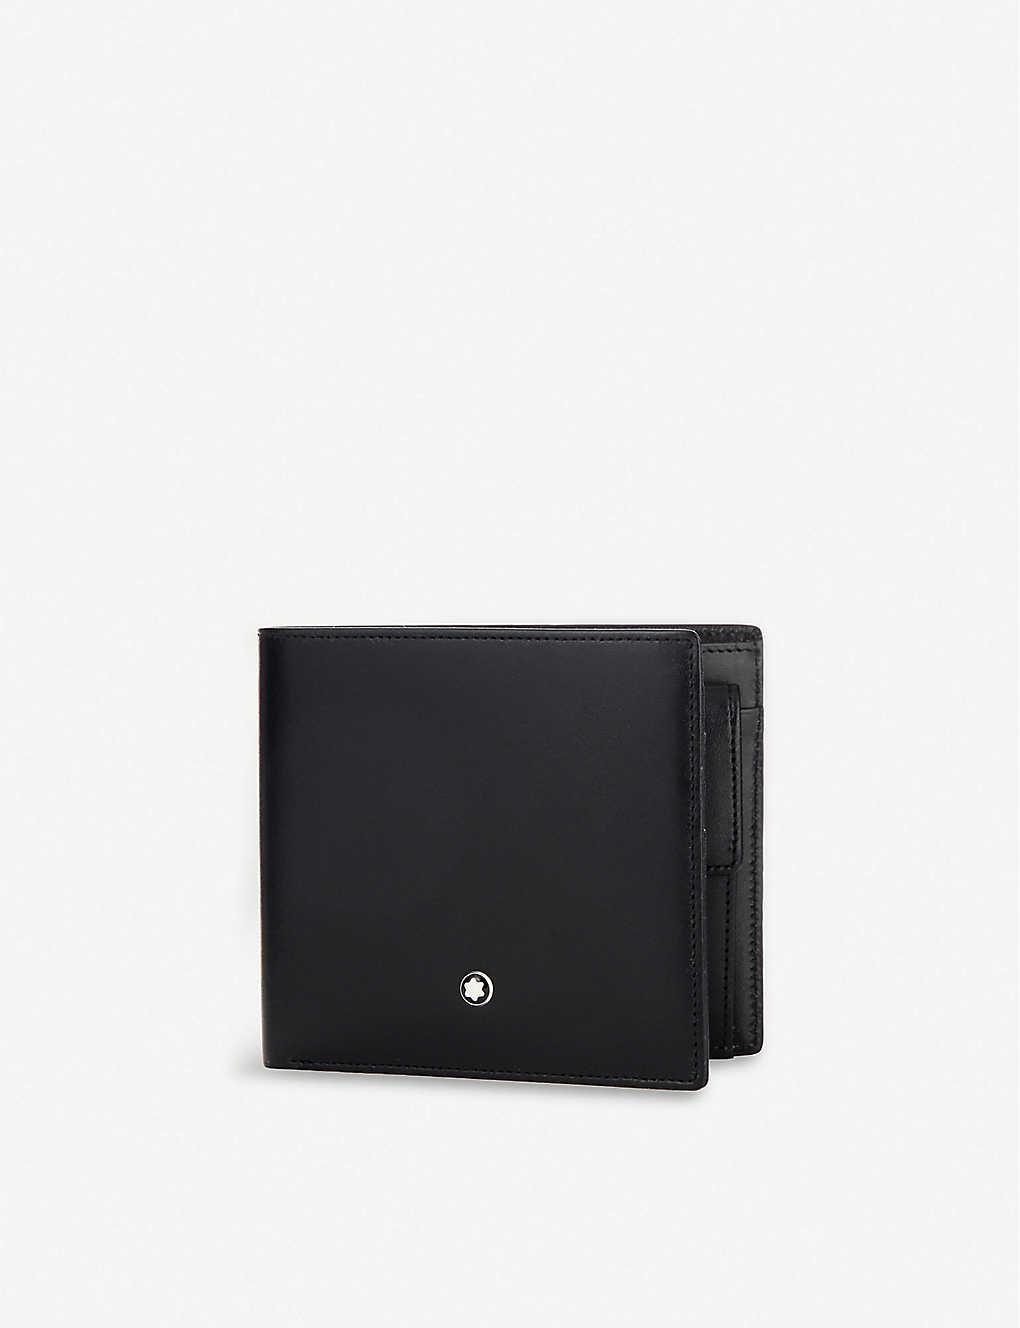 bec908168ba24 MONTBLANC - Meisterstück leather 4cc wallet | Selfridges.com